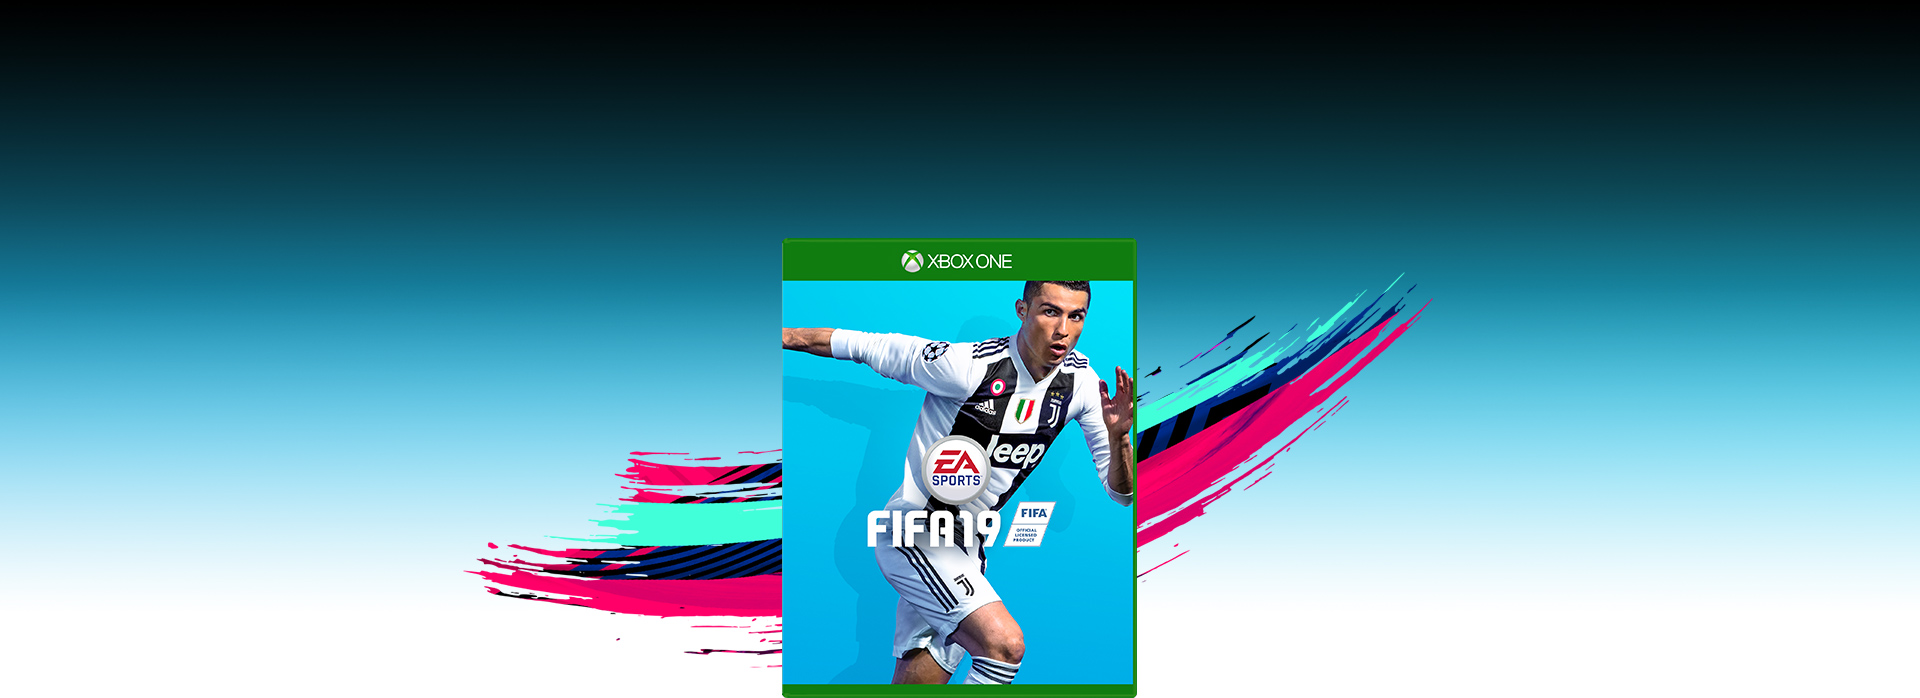 《FIFA 19》产品图像